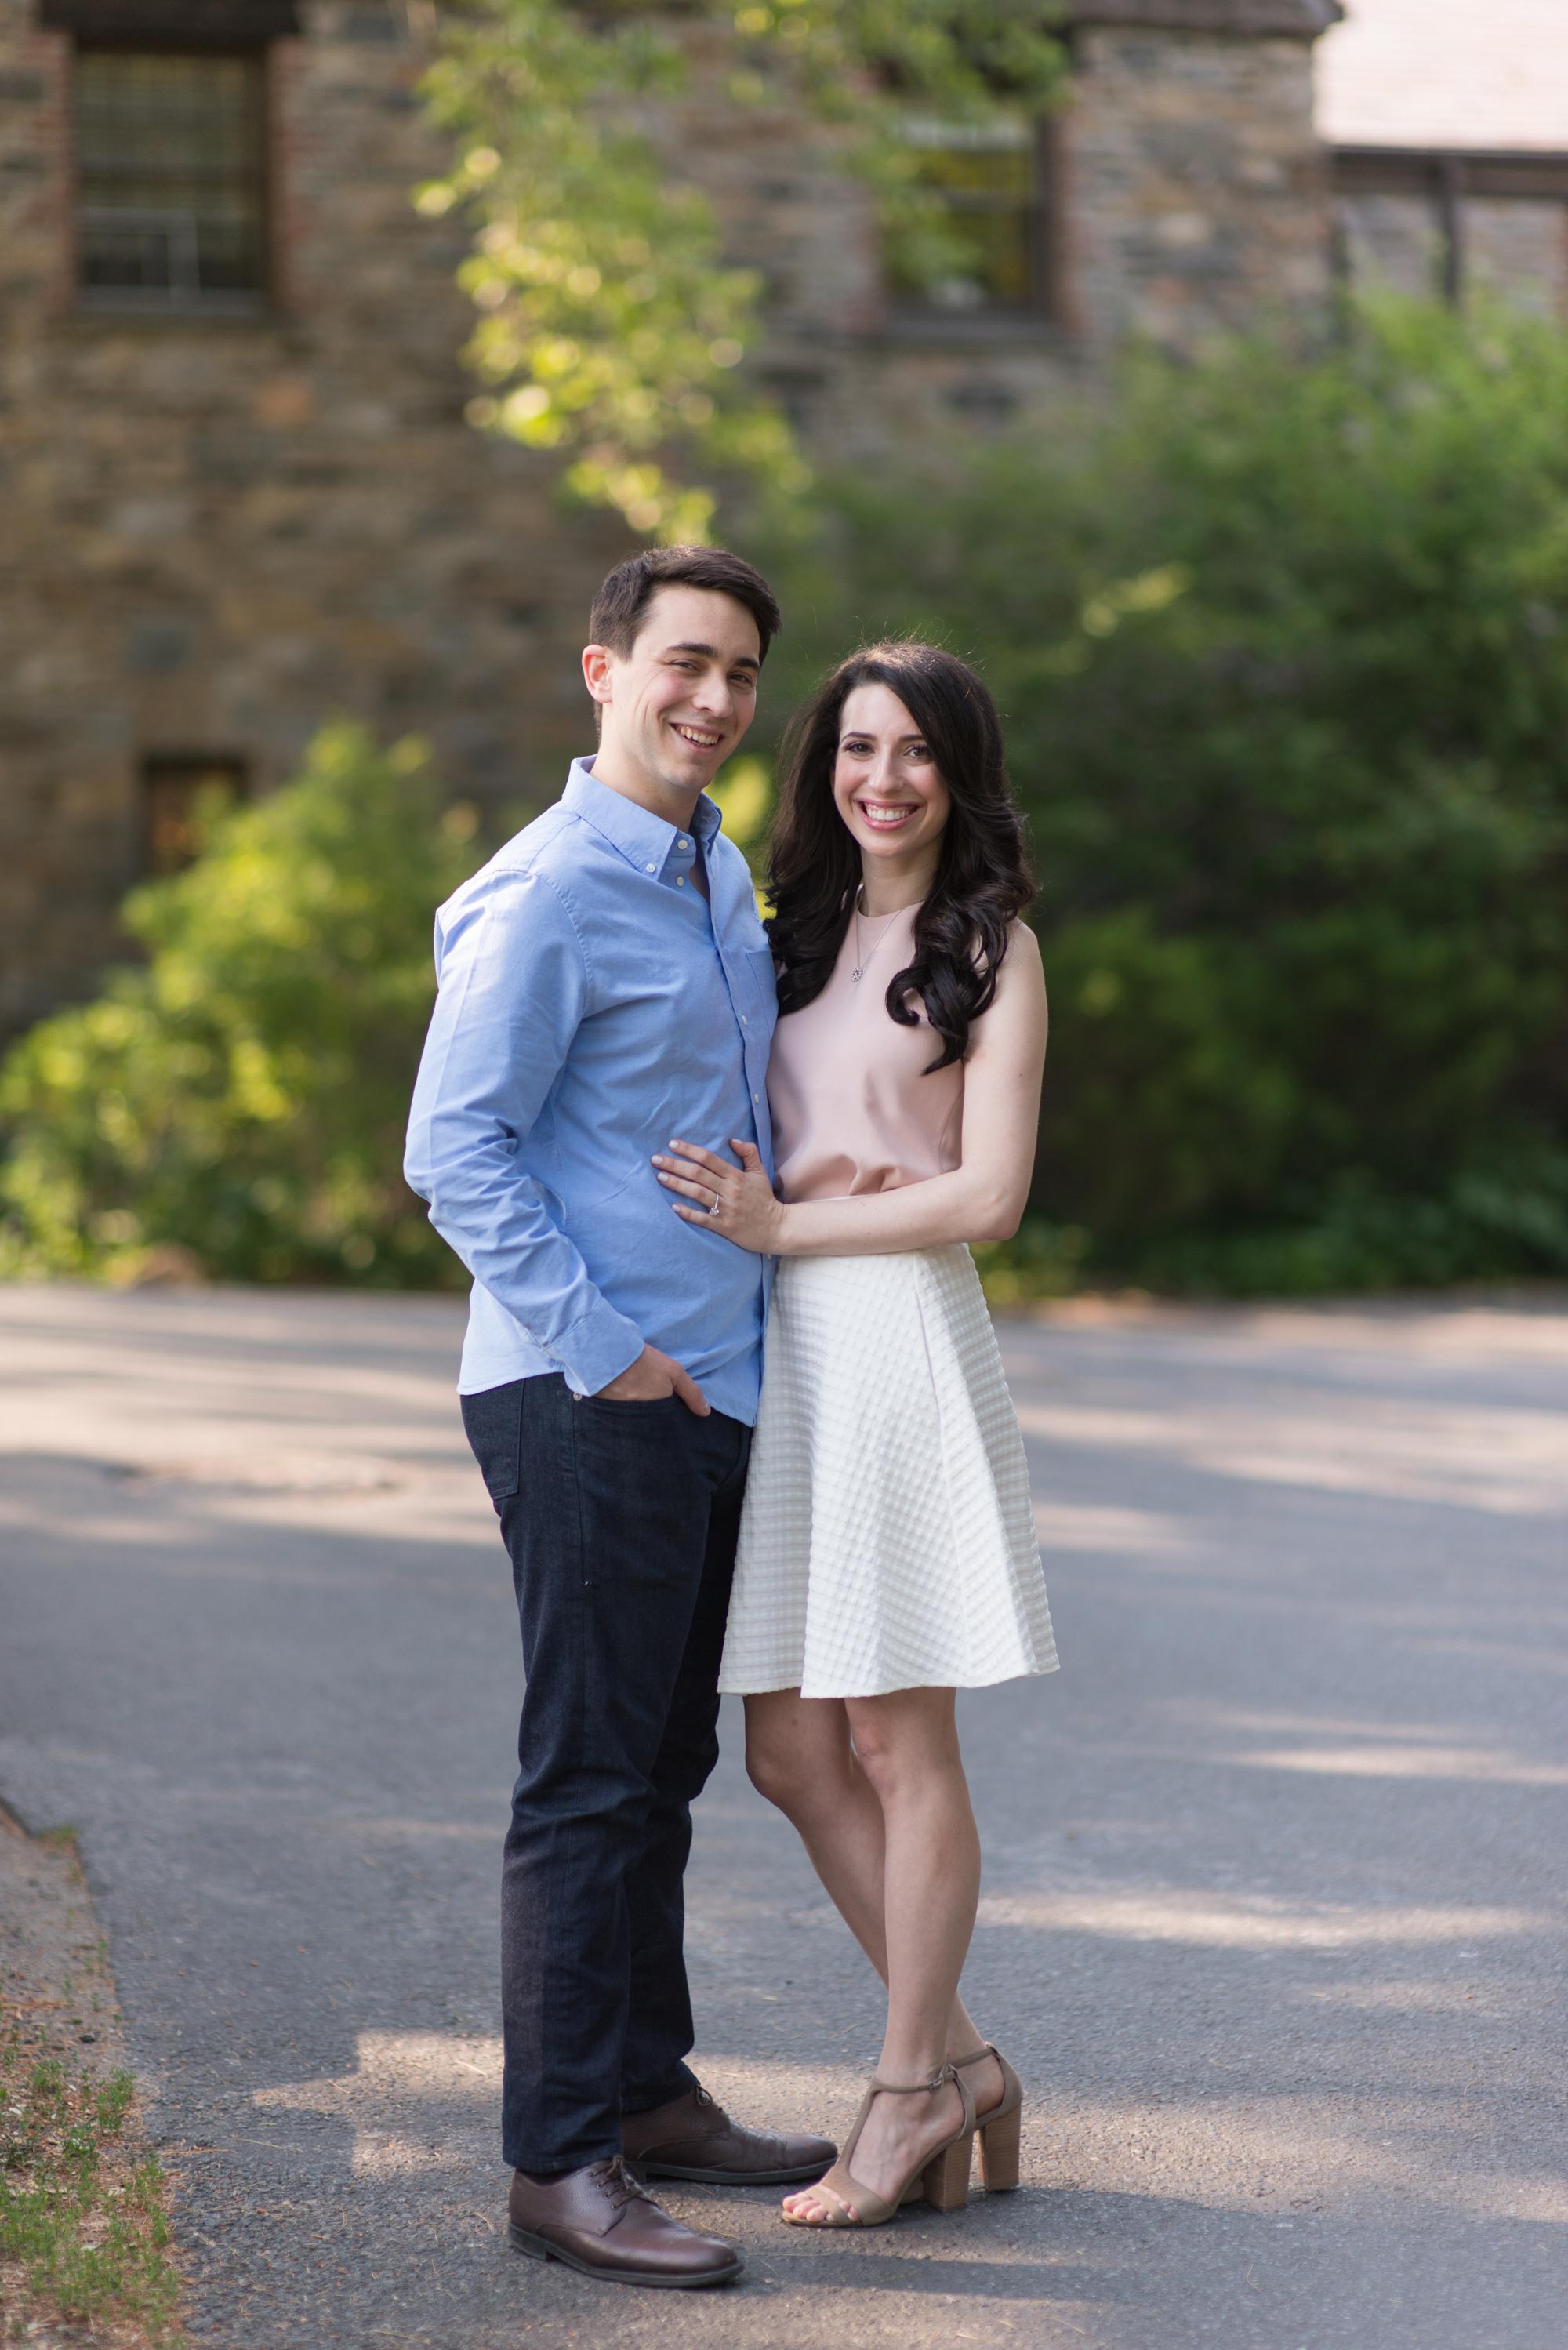 Emily&Aaron_Engagement001.JPG